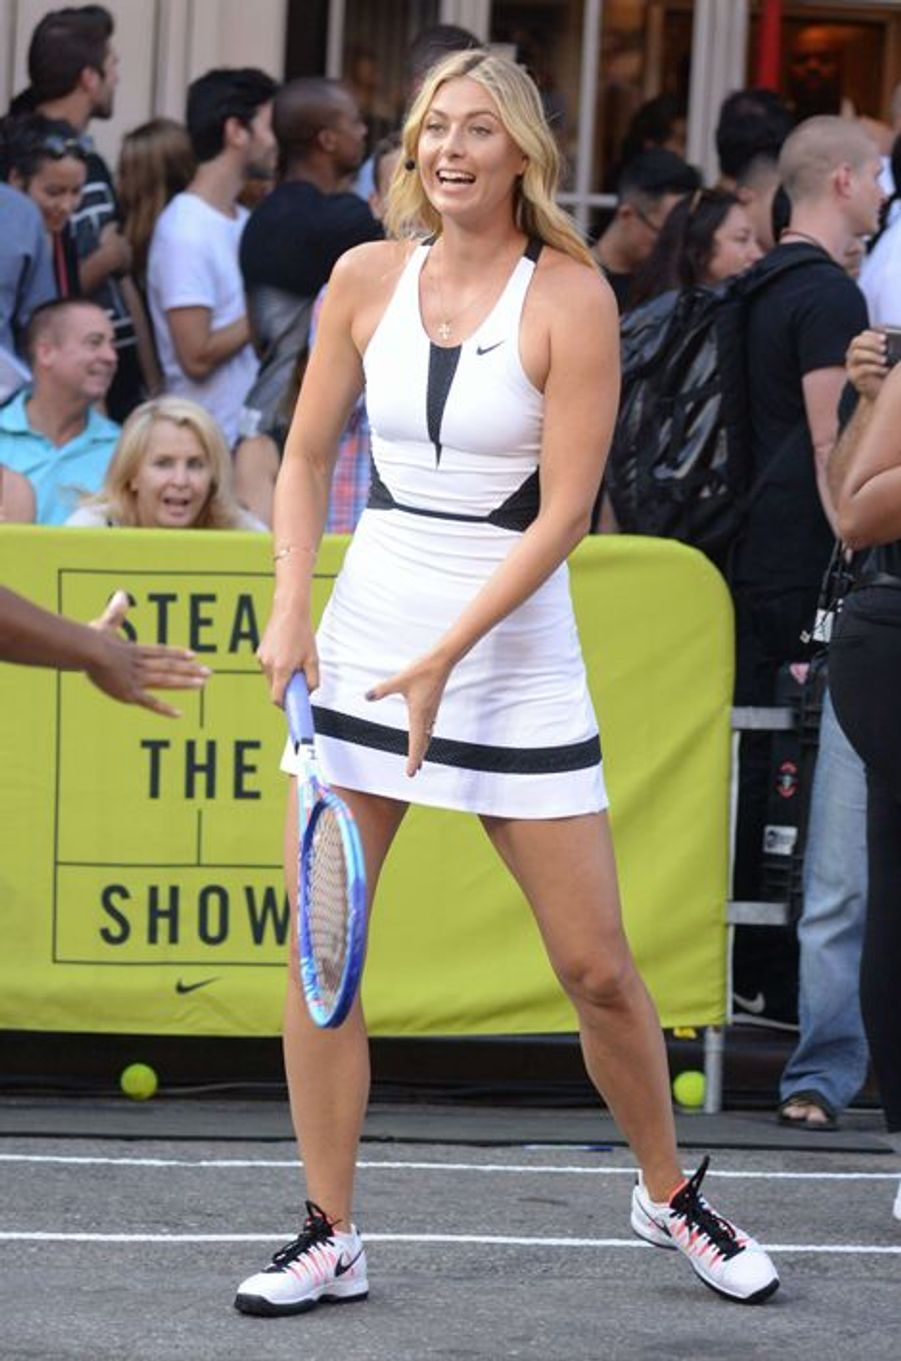 Maria Sharapova à New York pour l'événement Nike Street Tennis